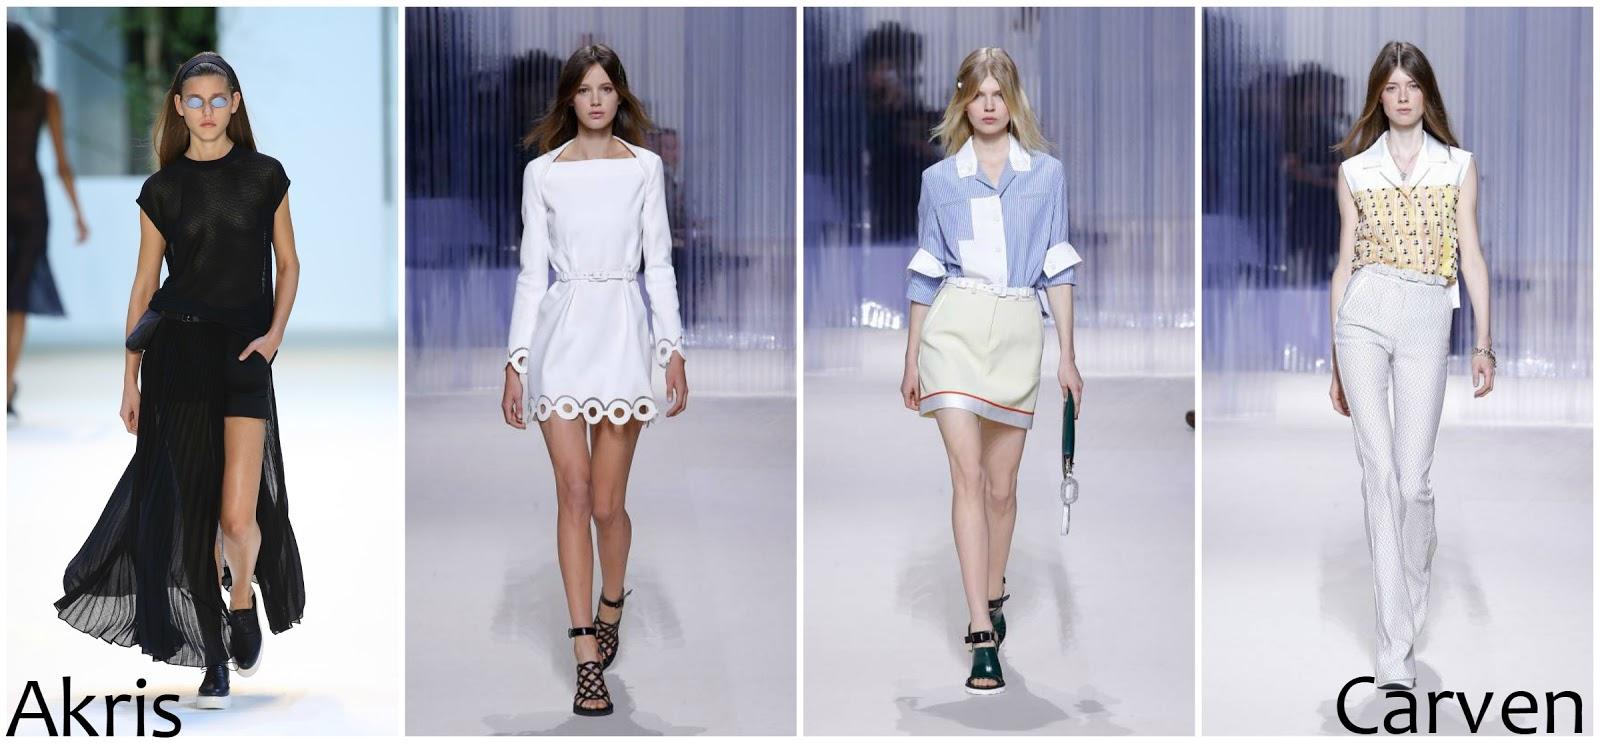 Akris Carven runway fashion